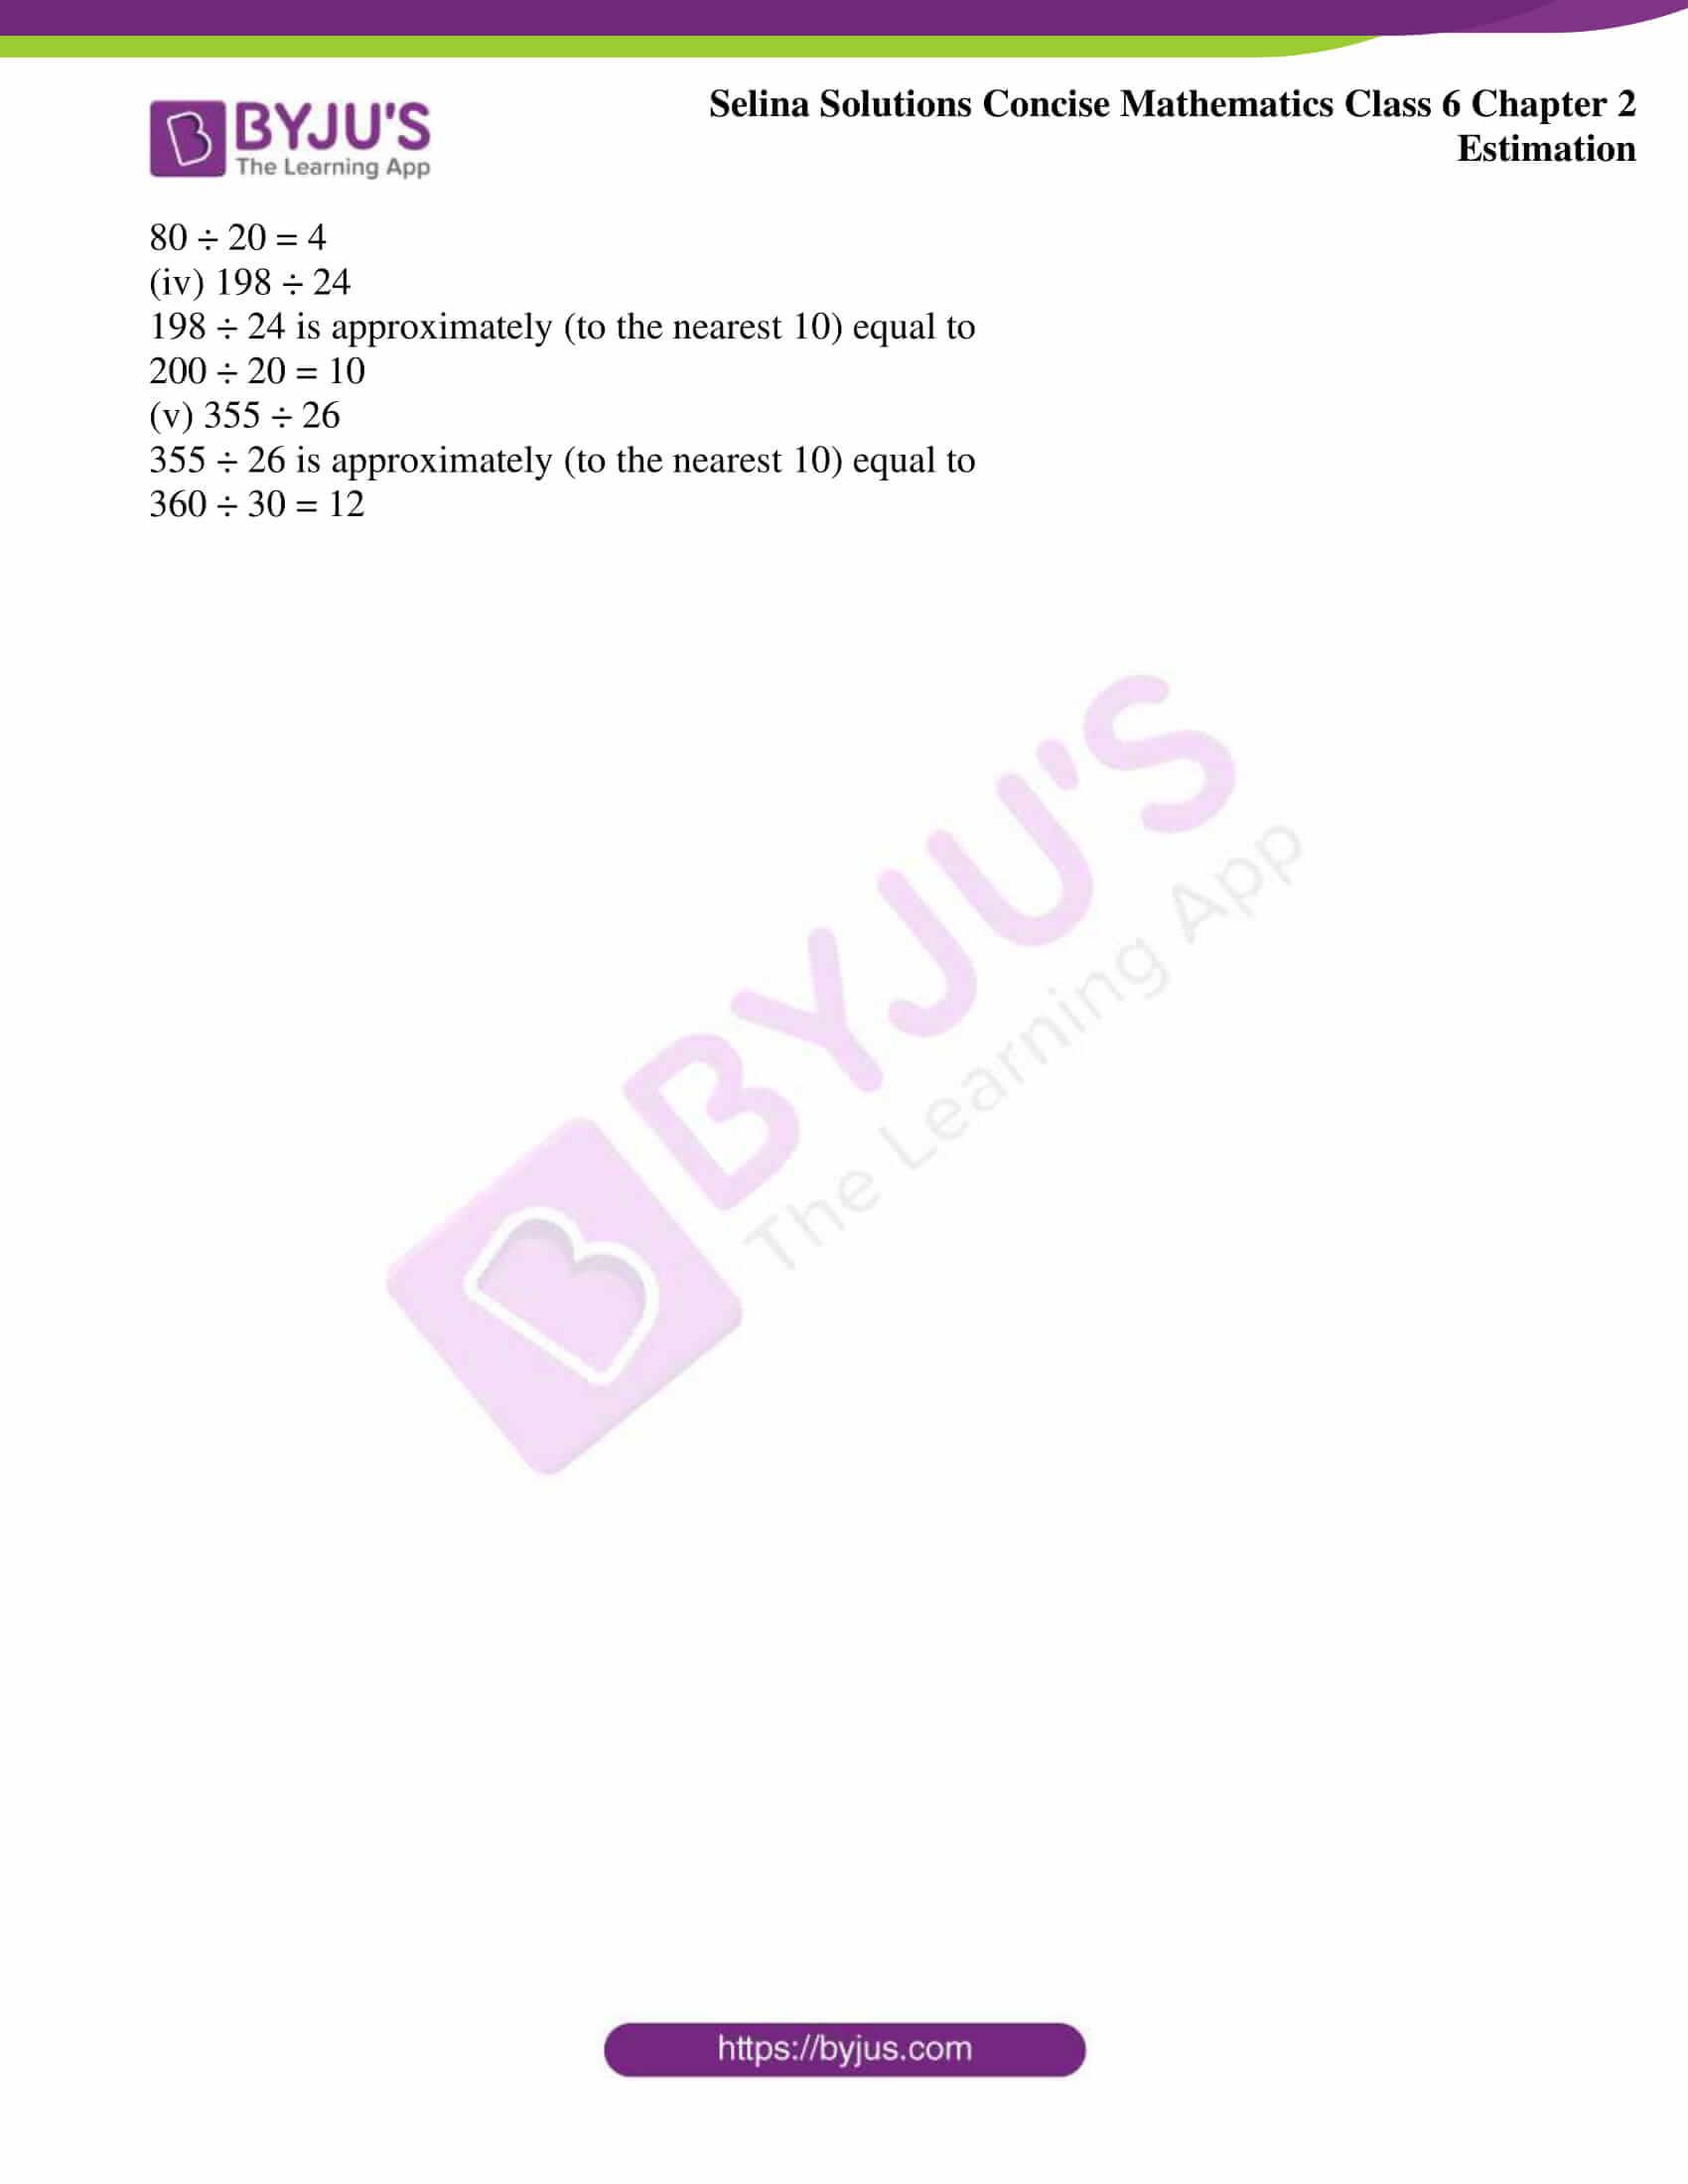 selina sol concise maths class 6 ch2 ex 2b 7